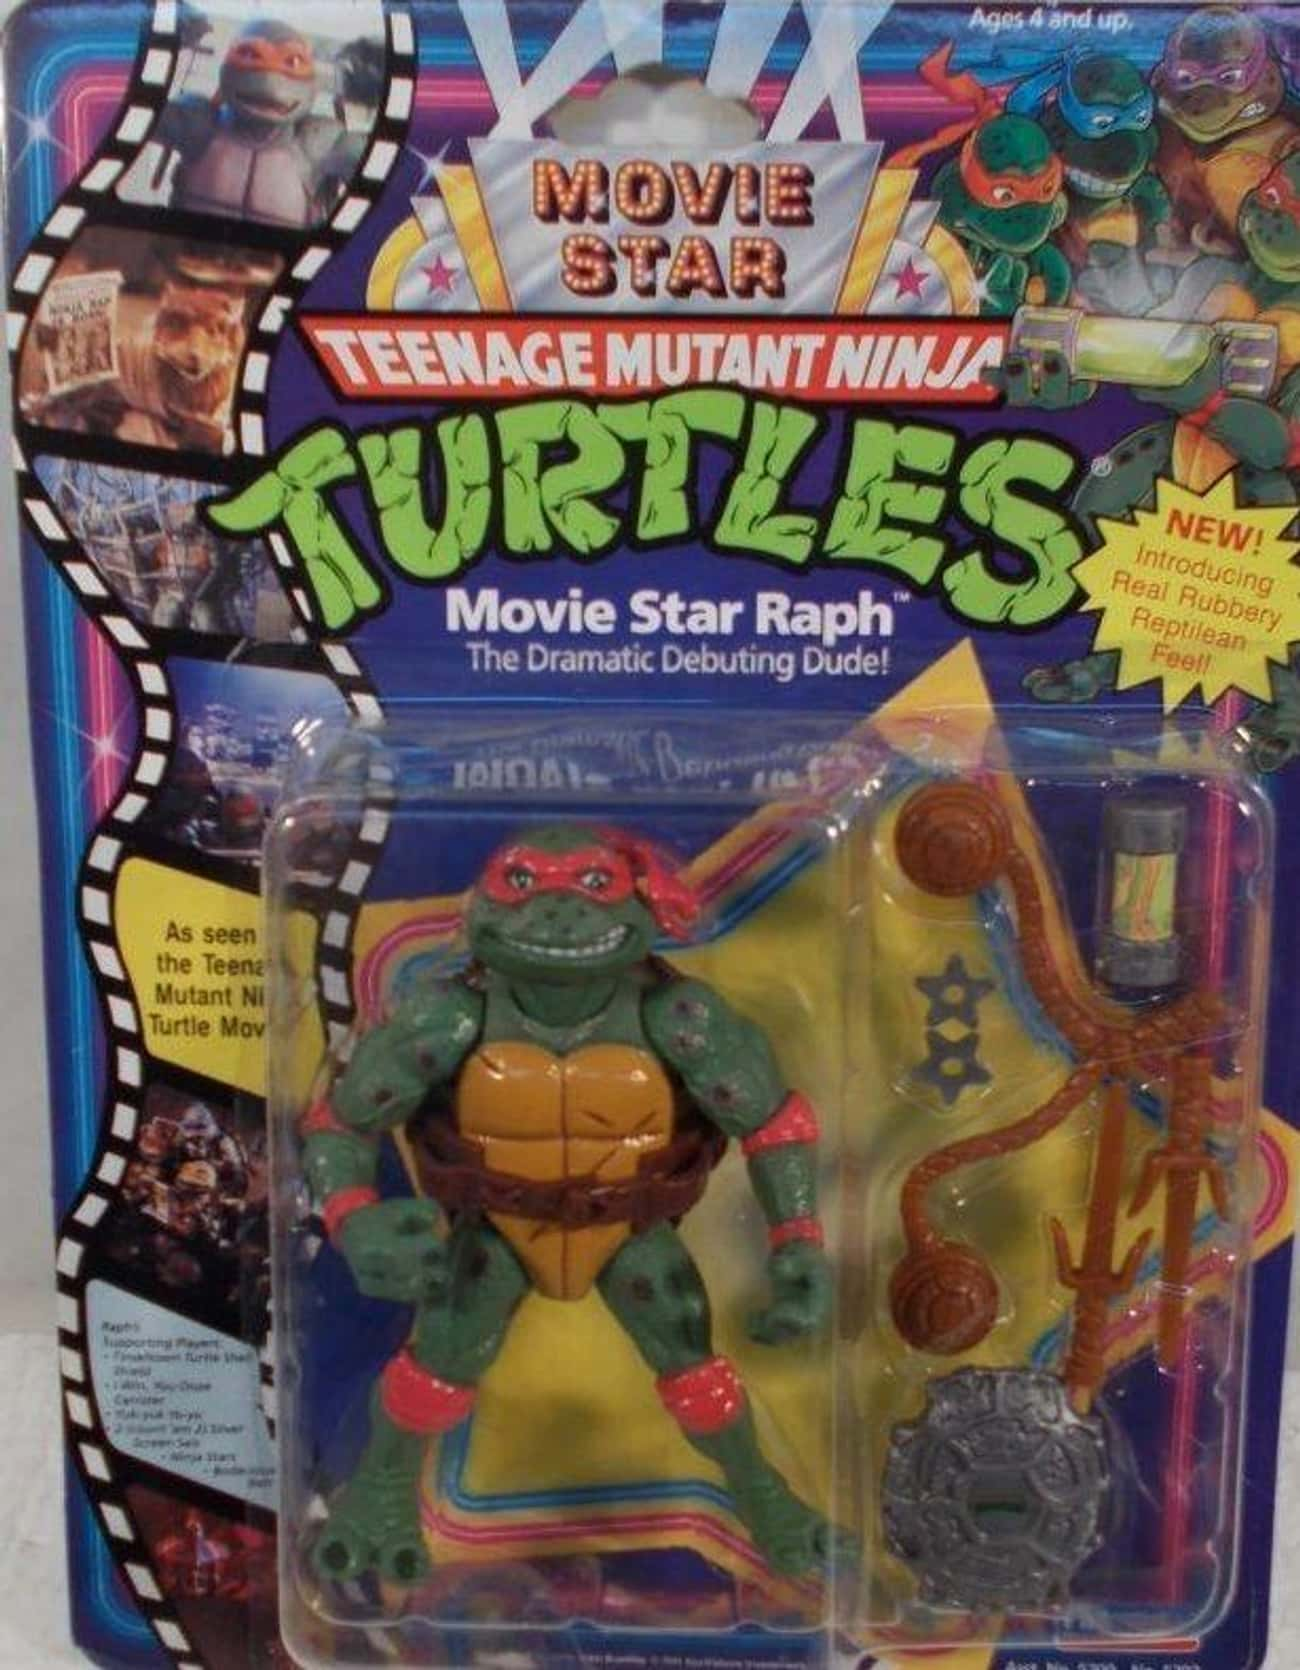 Movie Star Turtles is listed (or ranked) 3 on the list The Most Ridiculous WTF Teenage Mutant Ninja Turtle Toys